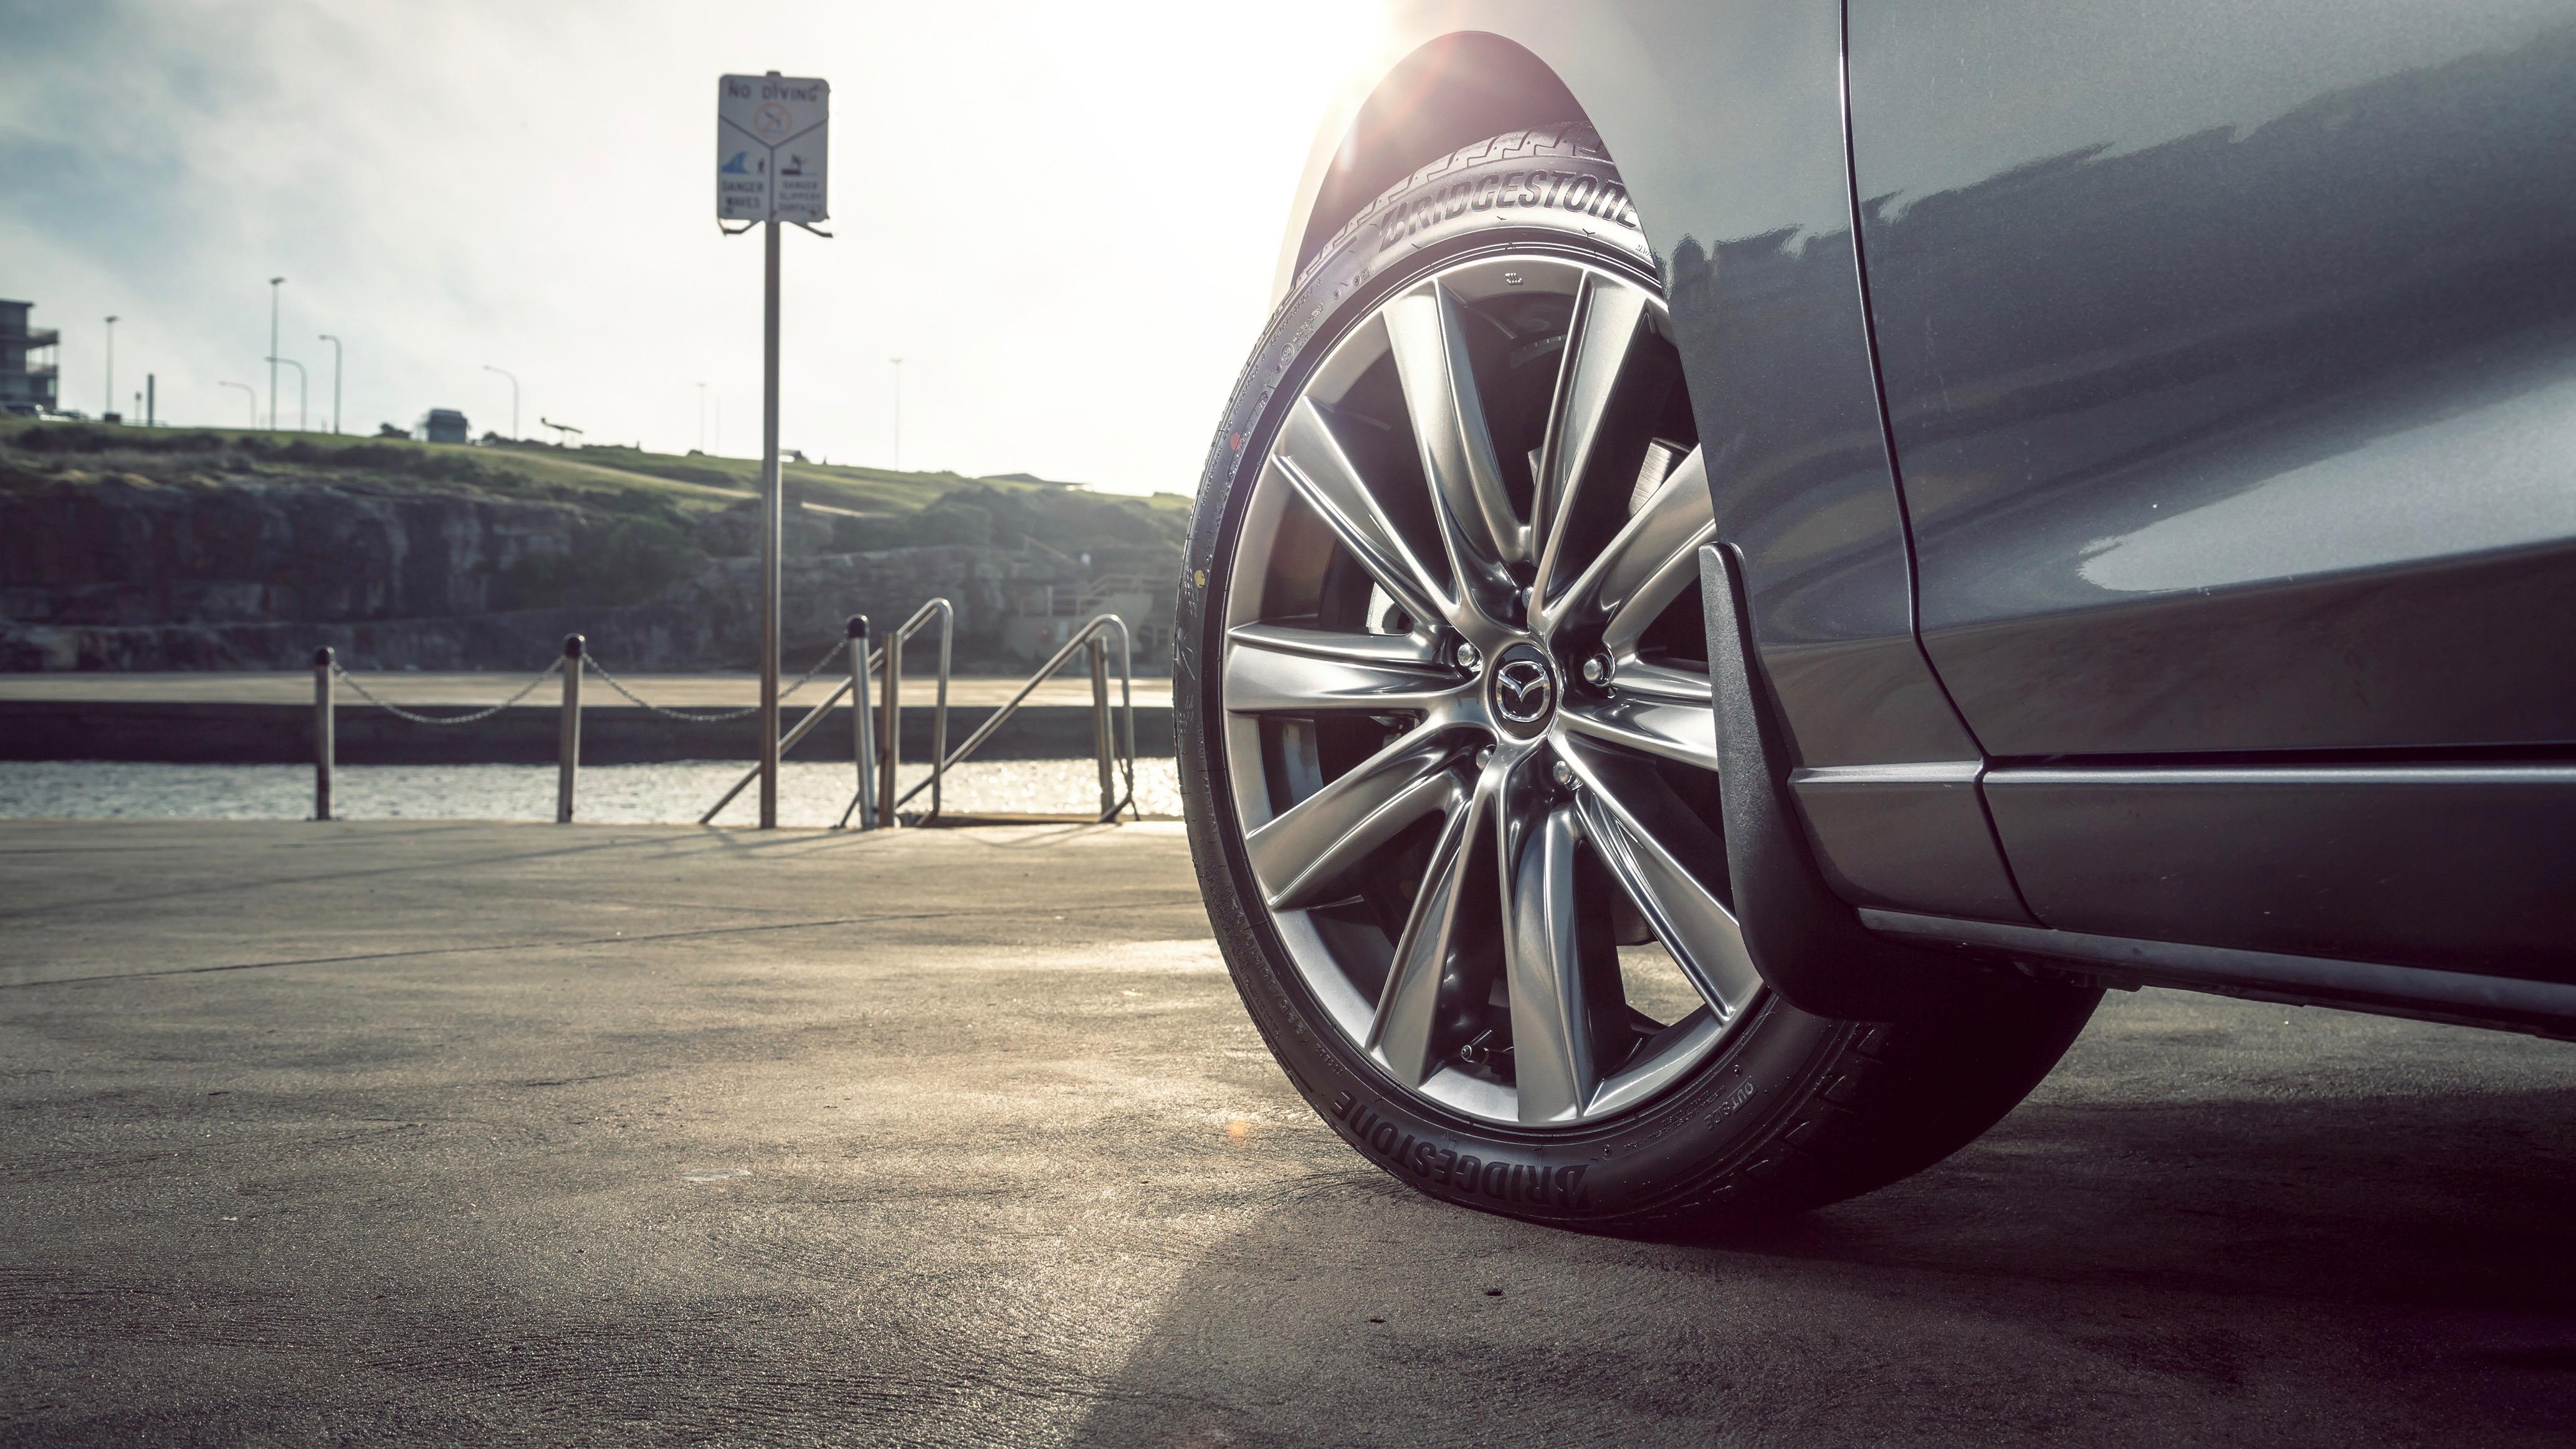 2018 Mazda 6 Atenza wheel detail